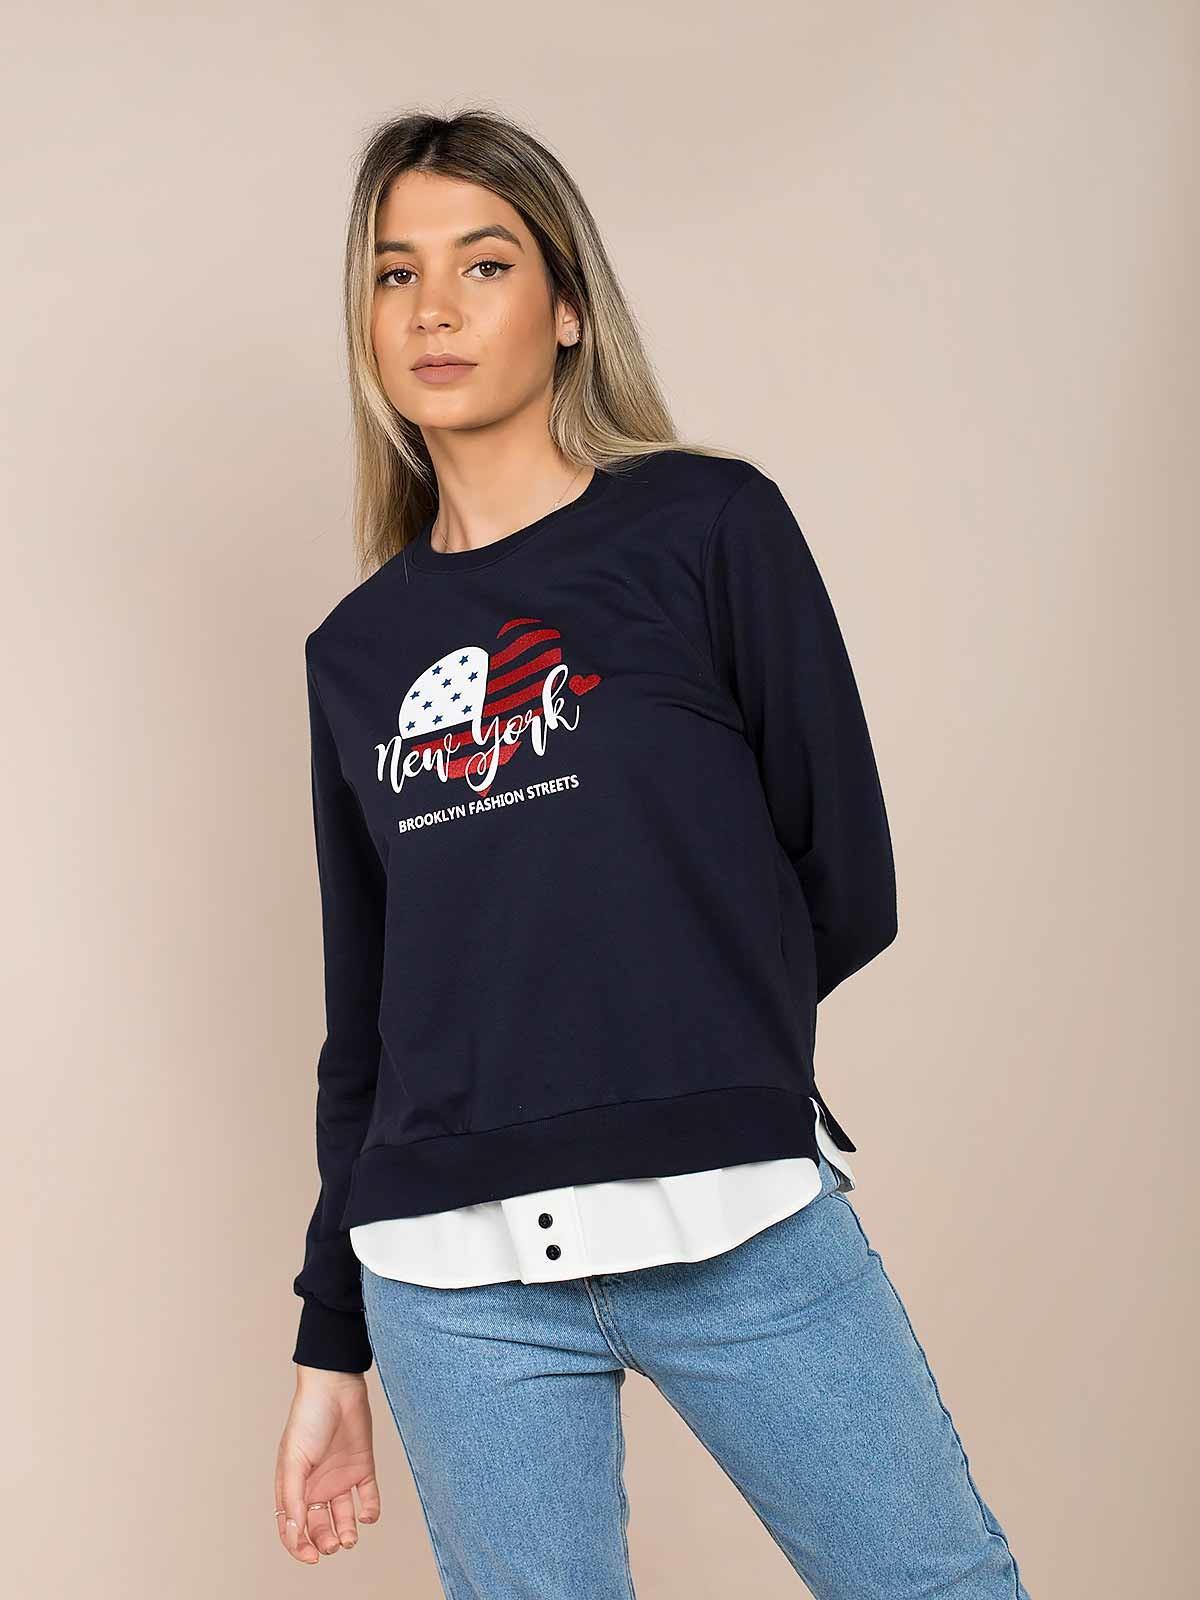 Camisola sweatshirt New York